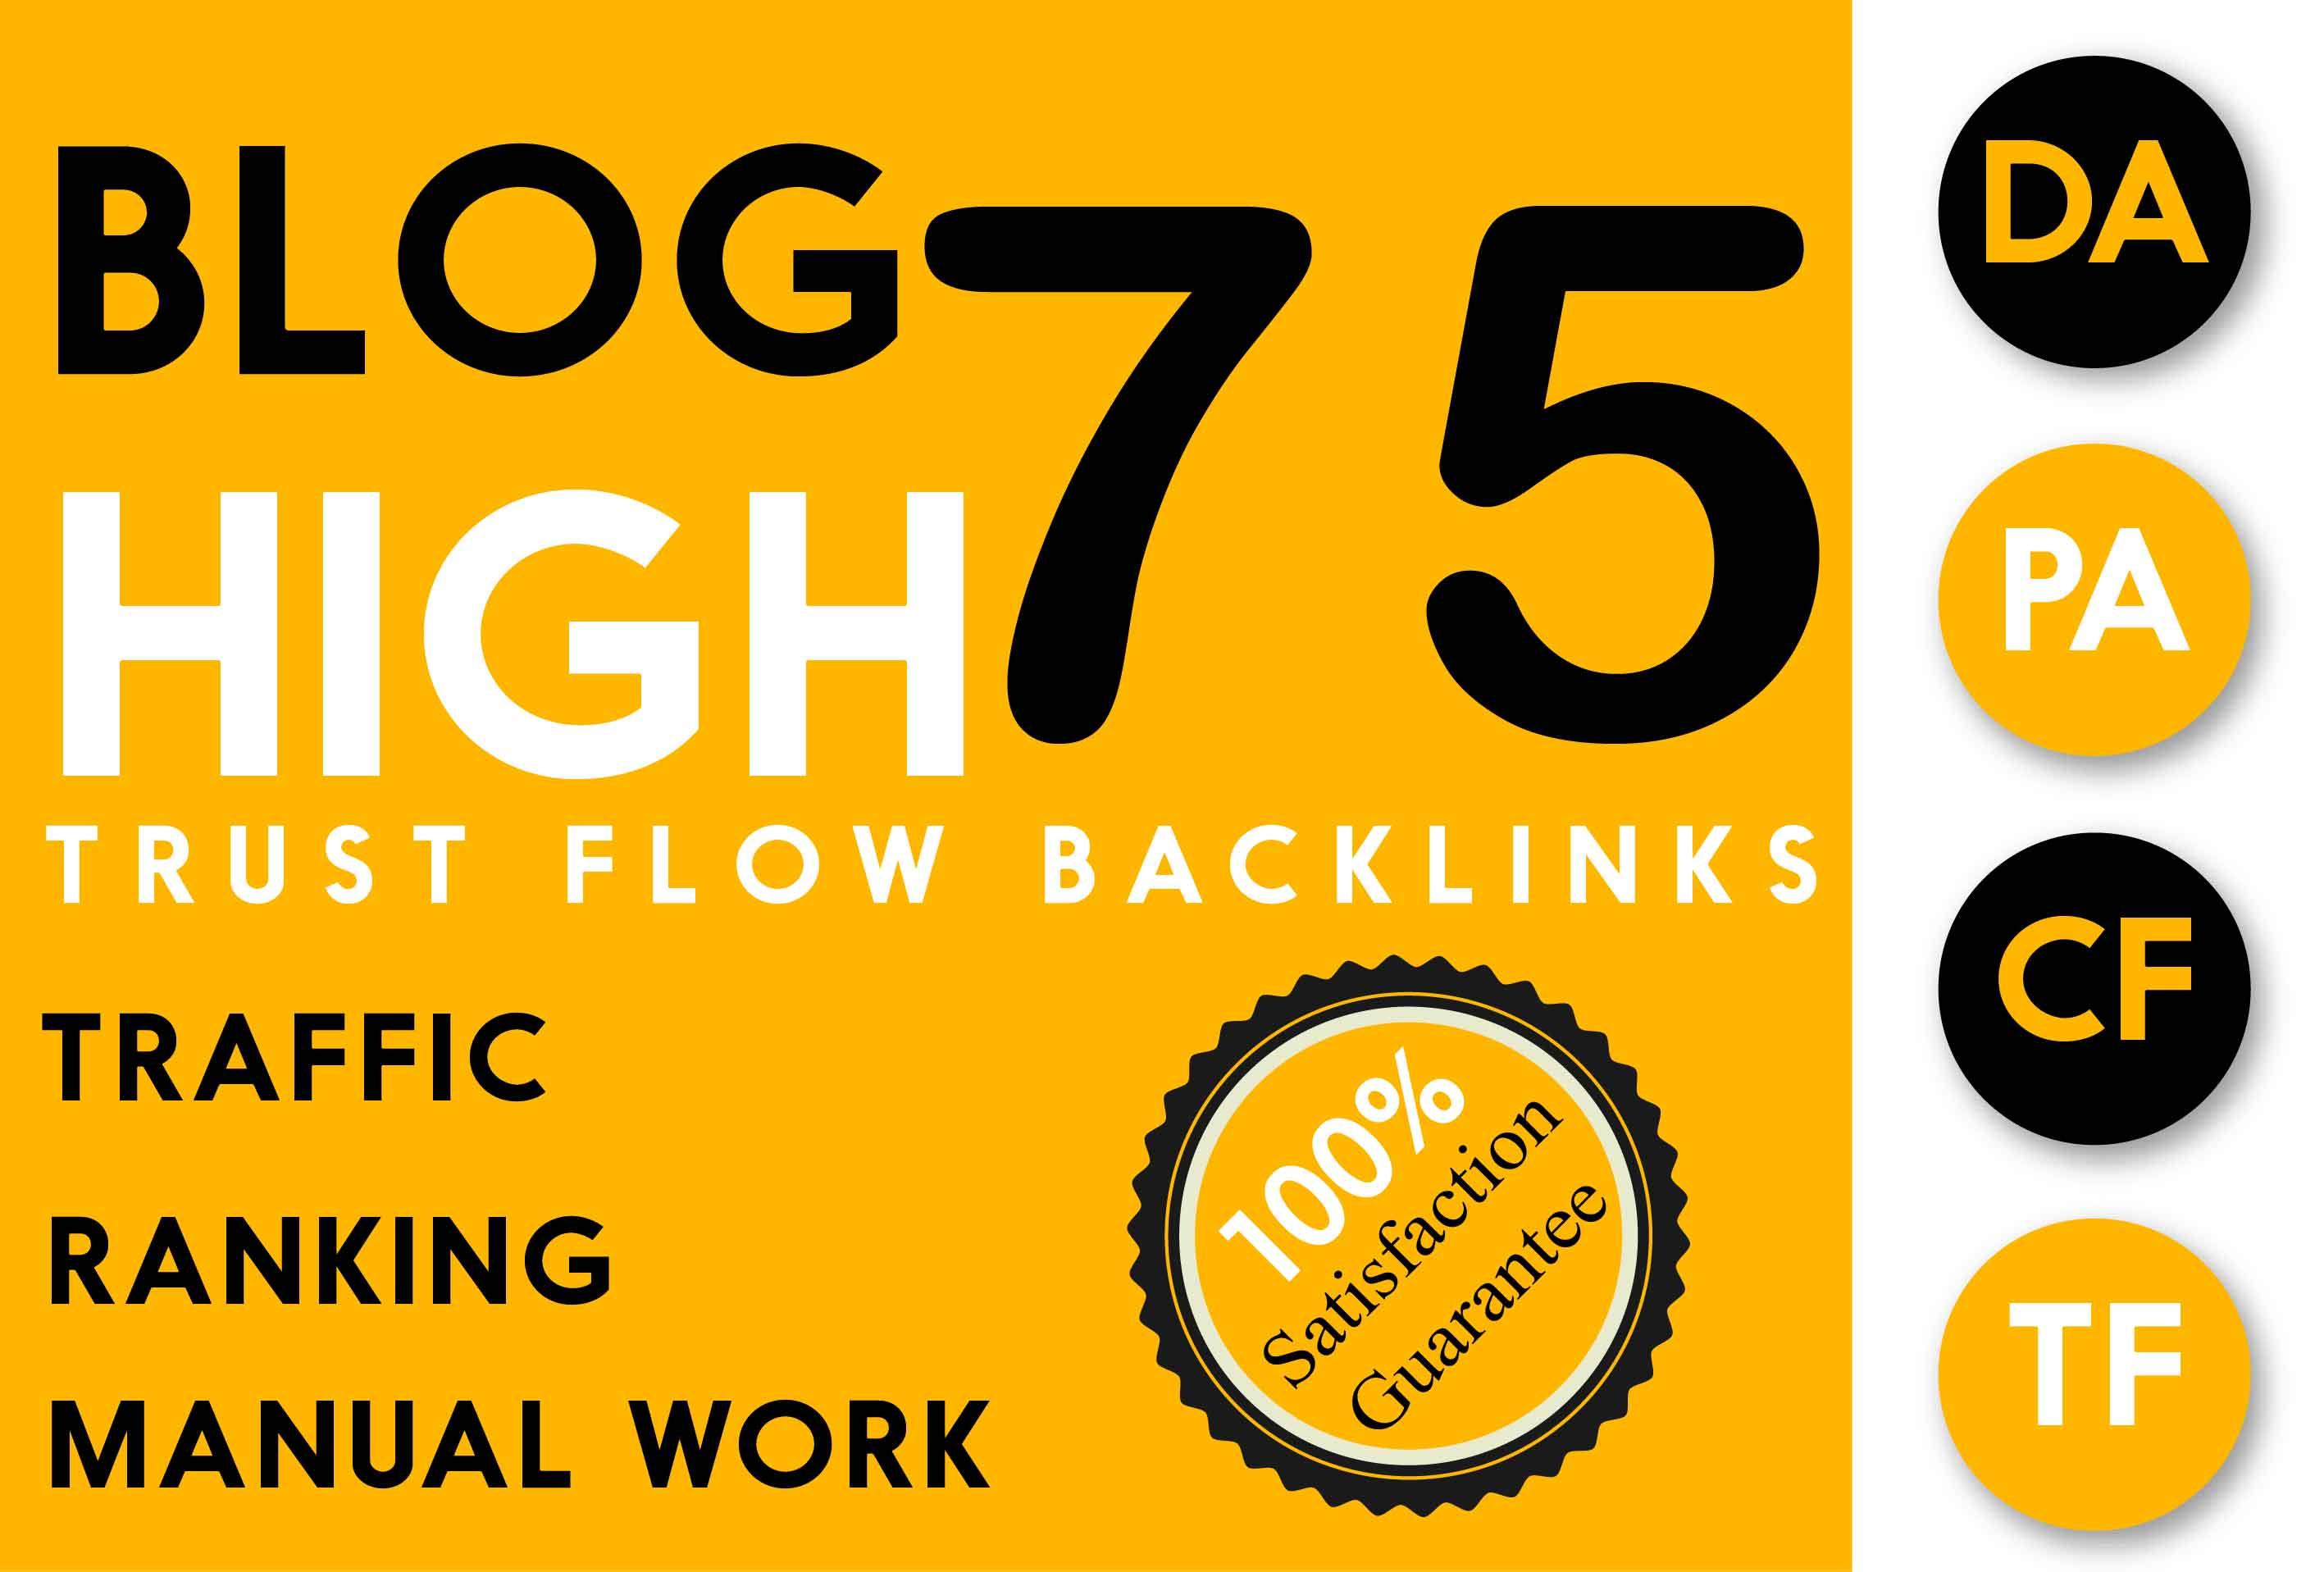 Do High Quality 75 Trust Flow And Citation Flow SEO Backlinks On Tf30 Da50